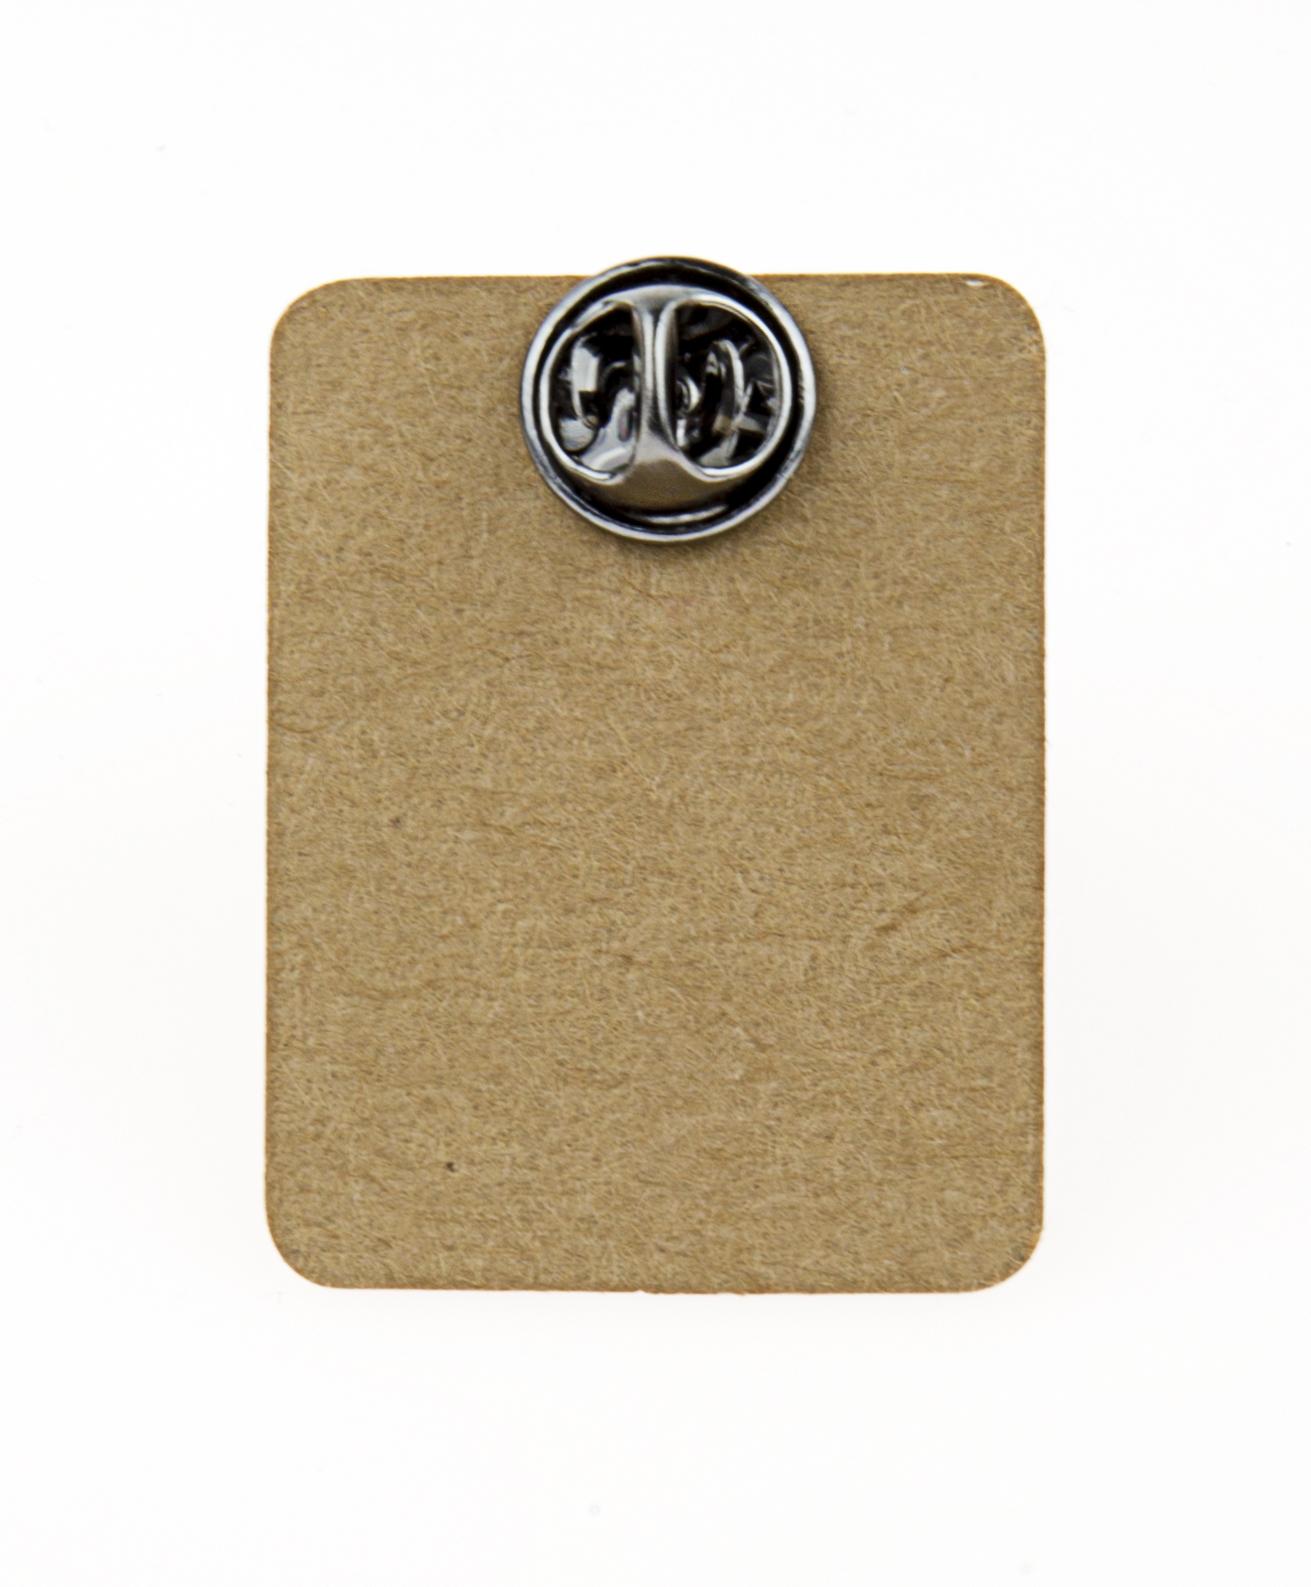 Metal Peter Pan Enamel Pin Badge